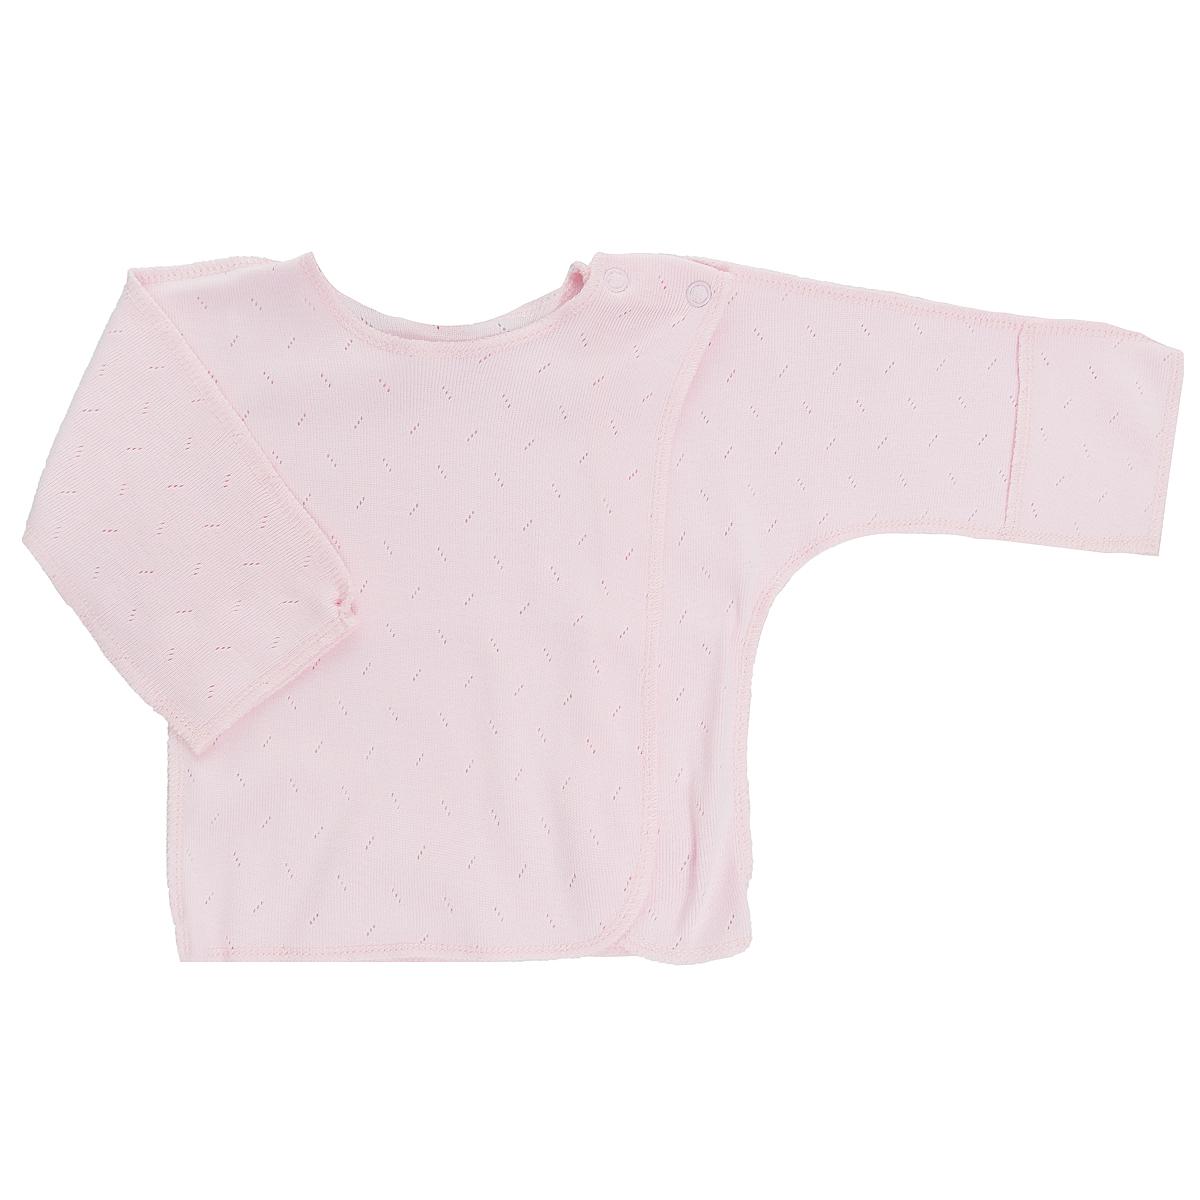 Распашонка Lucky Child Ажур цвет: розовый. 0-8. Размер 62/68